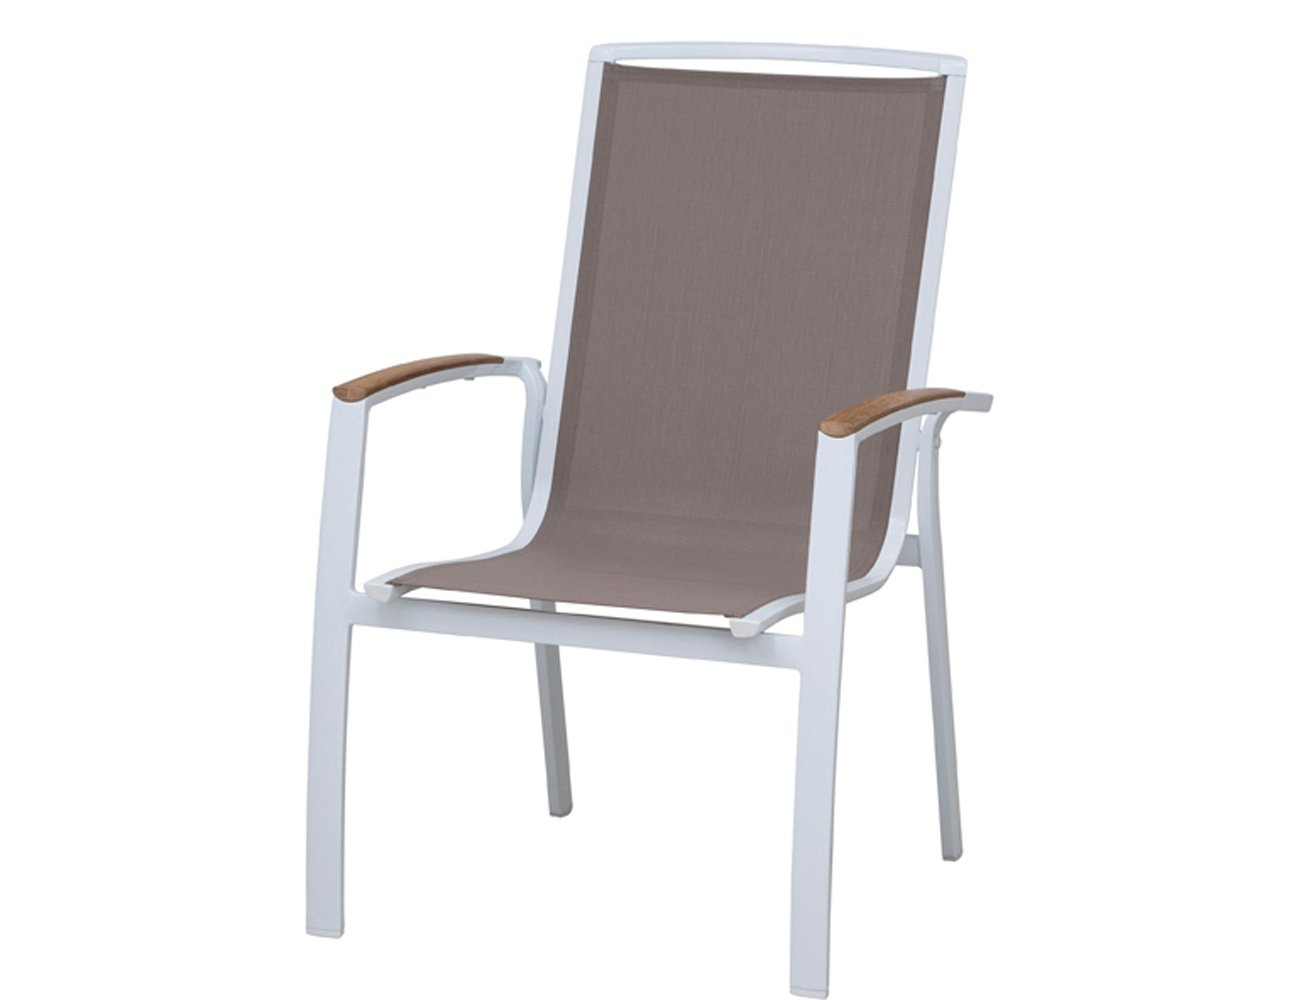 Siena Garden GFA-COC-001447 Stapelsessel Lindos, 68 x 65,5 x 100,5 cm , Aluminiumgestell weiß, Ranotex Textilfaser taupe